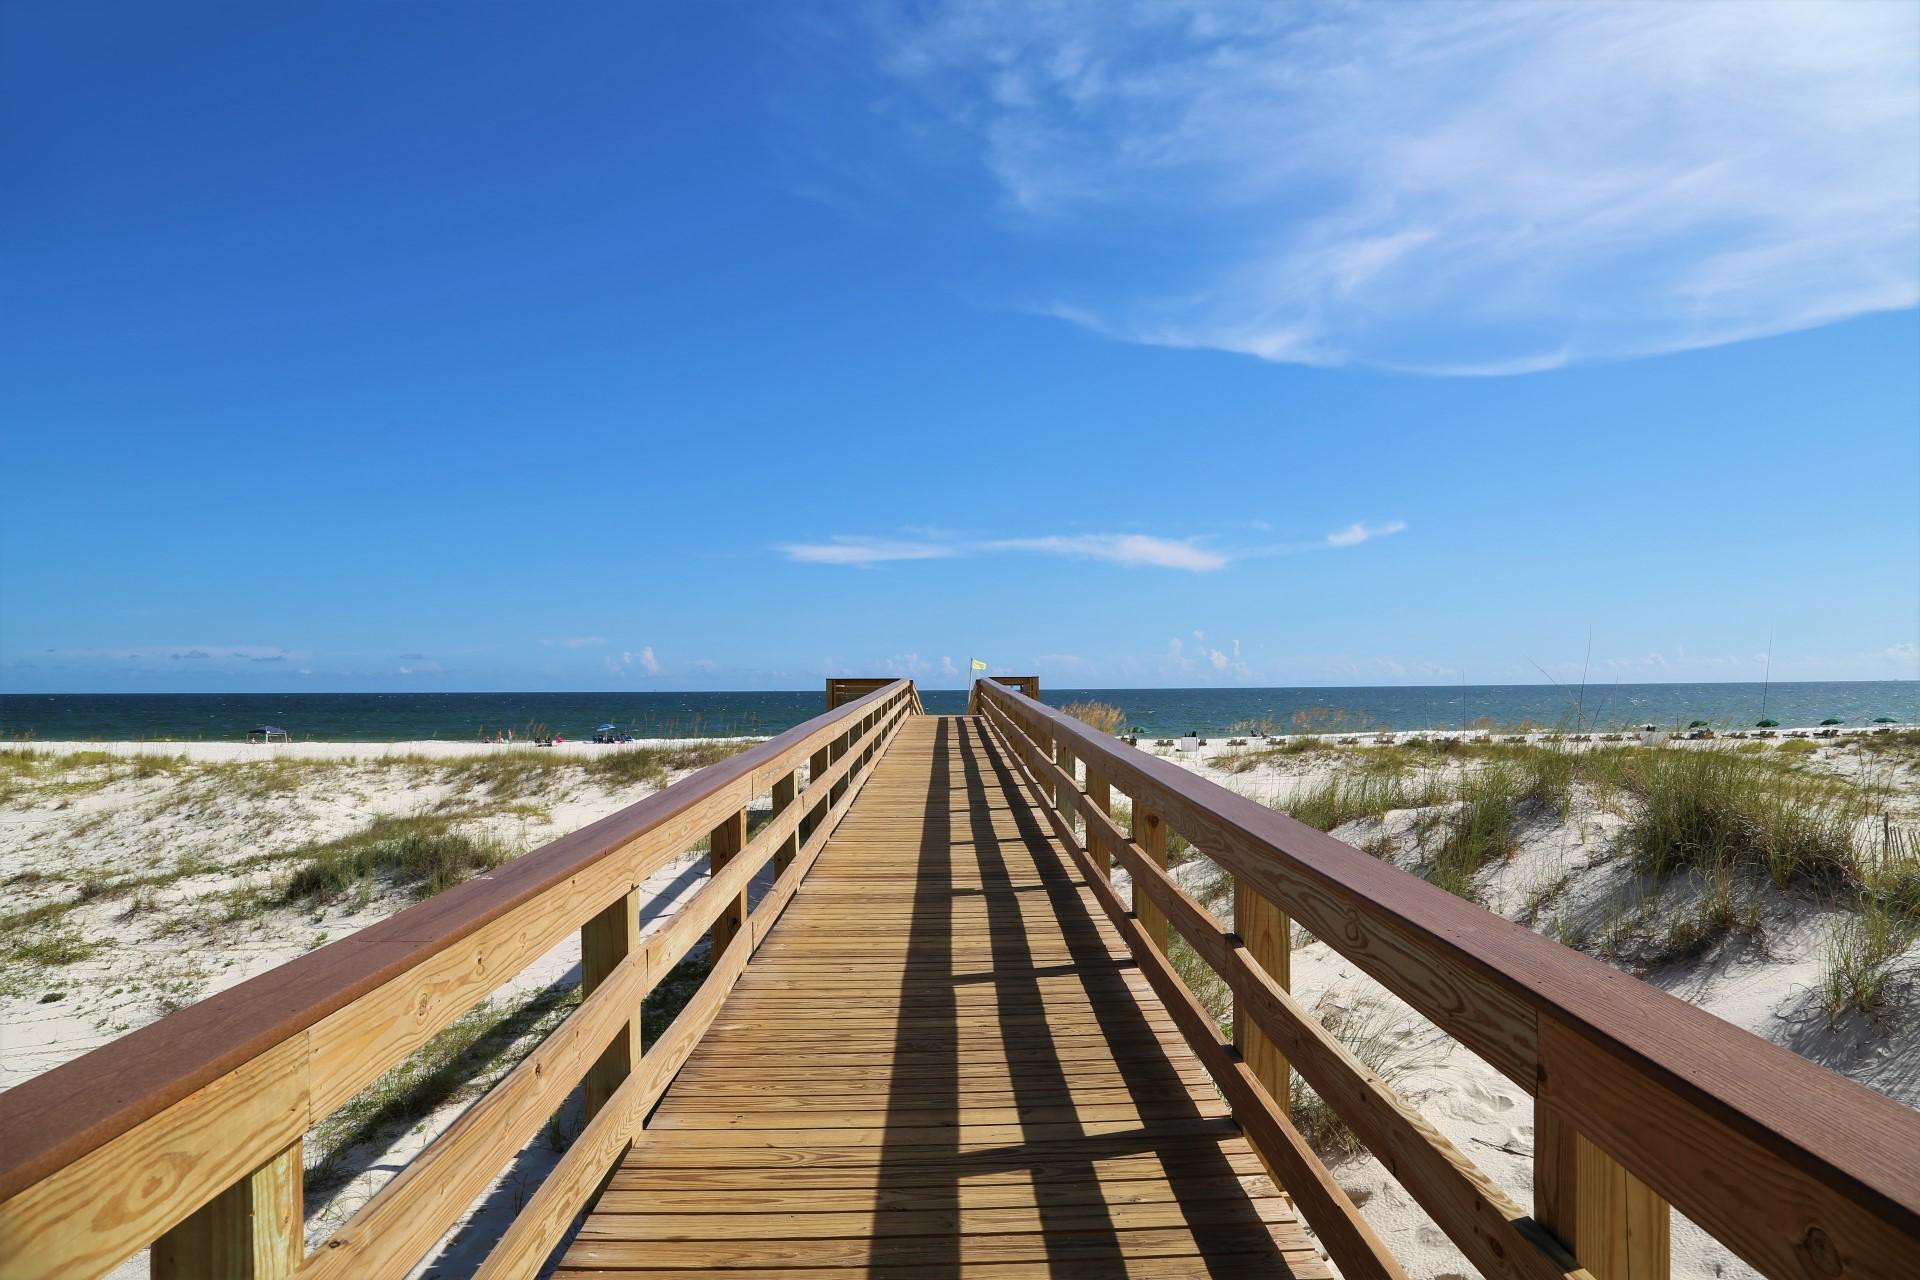 Fantastic new boardwalk!